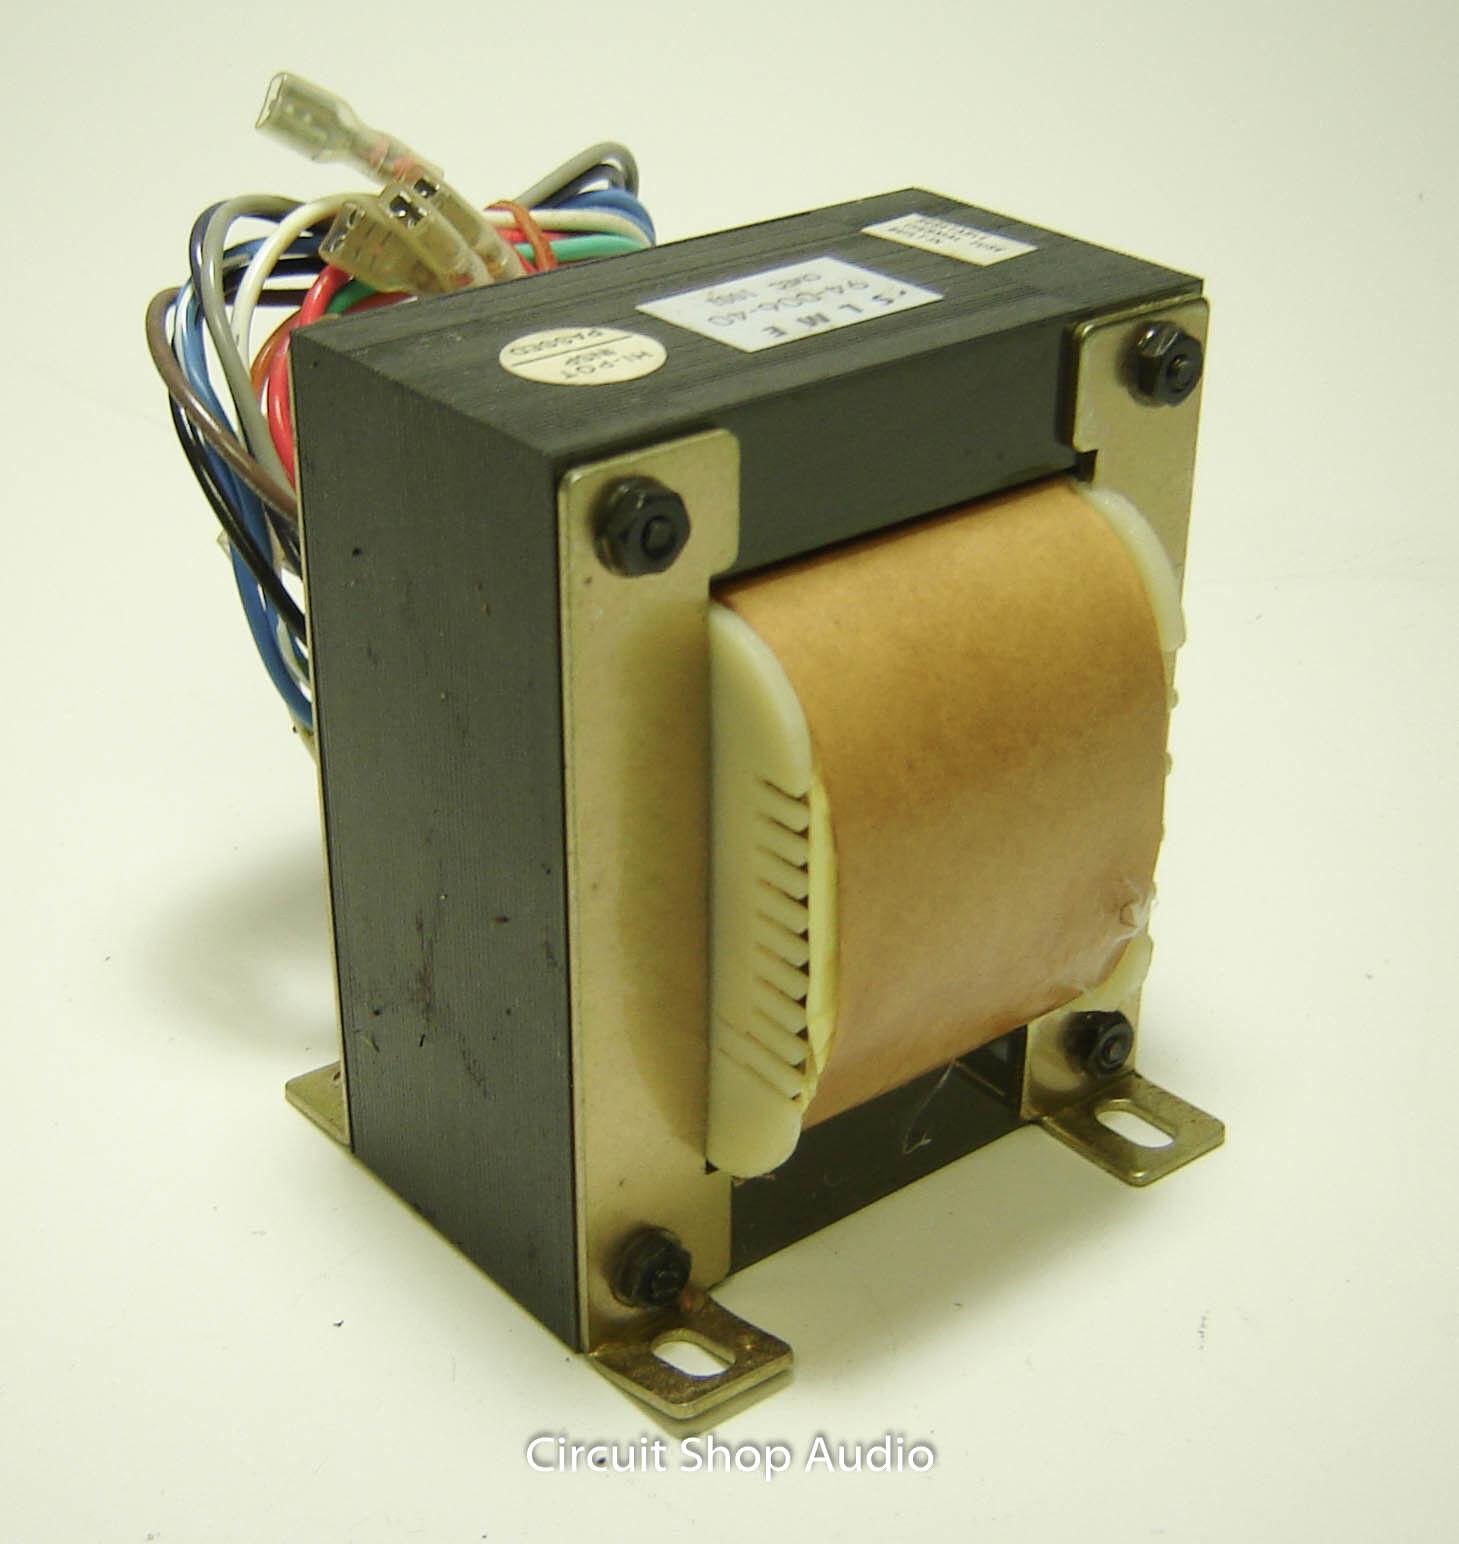 Nuevo Crate BFX-220H Export Transformador -- 94-006-40 Power Power Power 4cab08